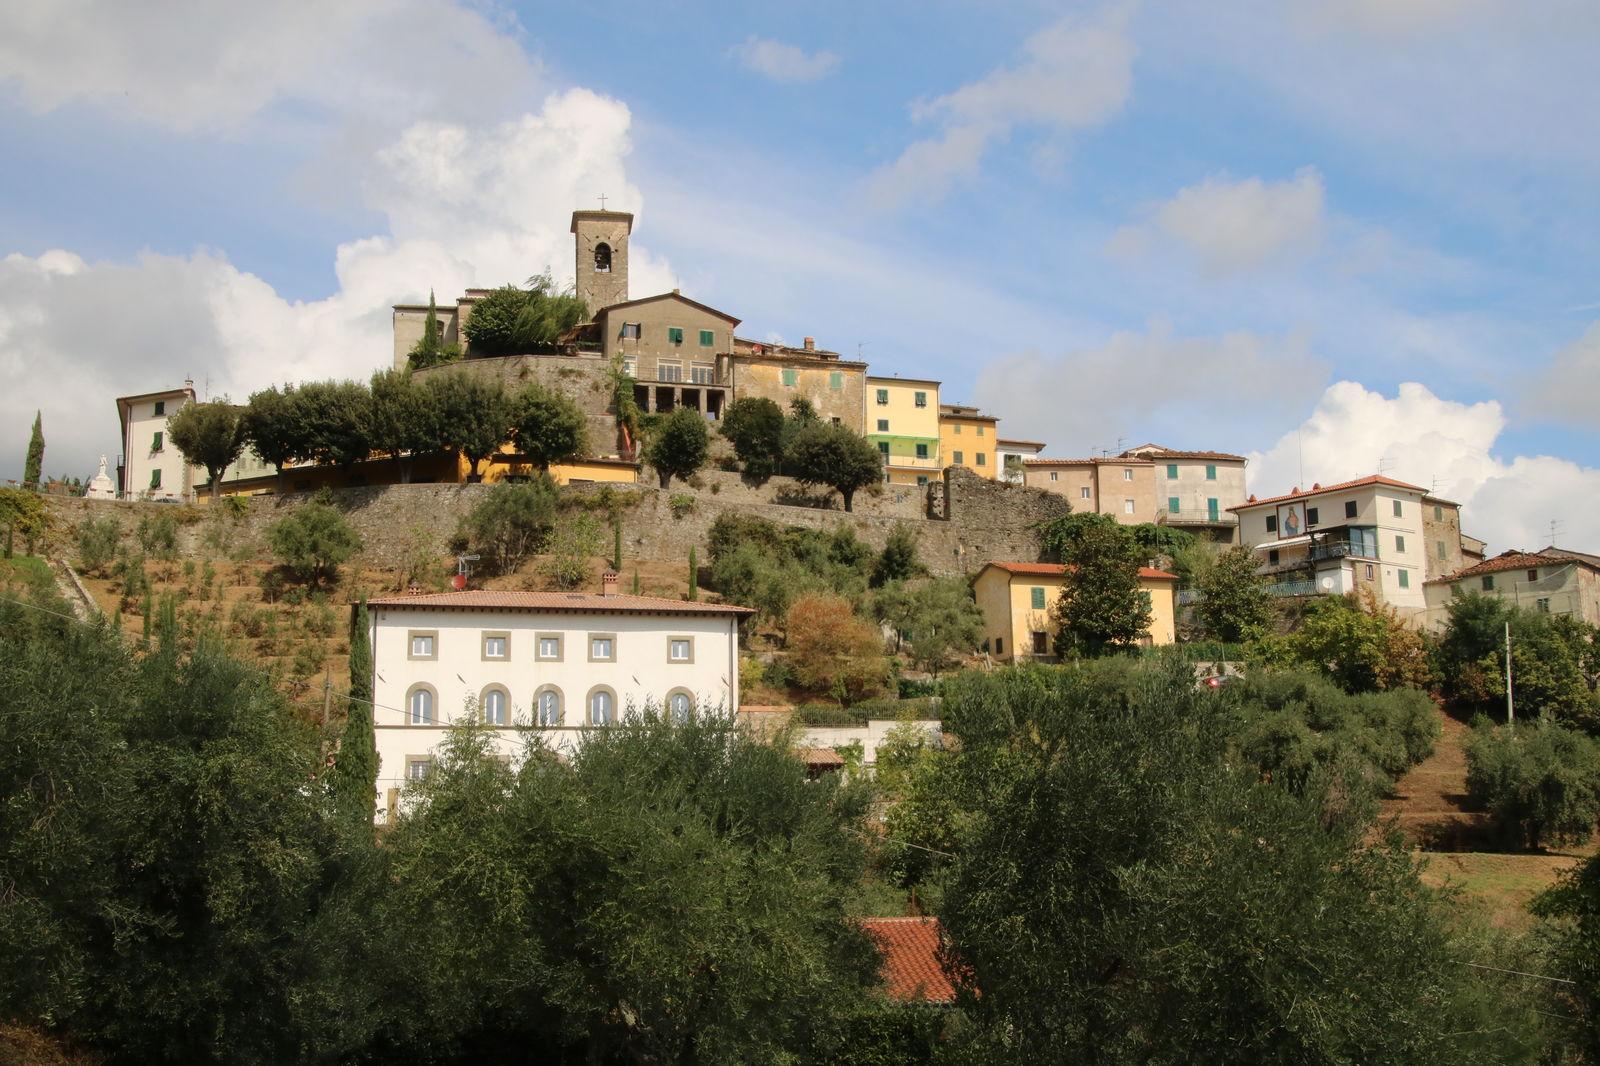 Marliana - The Voice of the Mountain